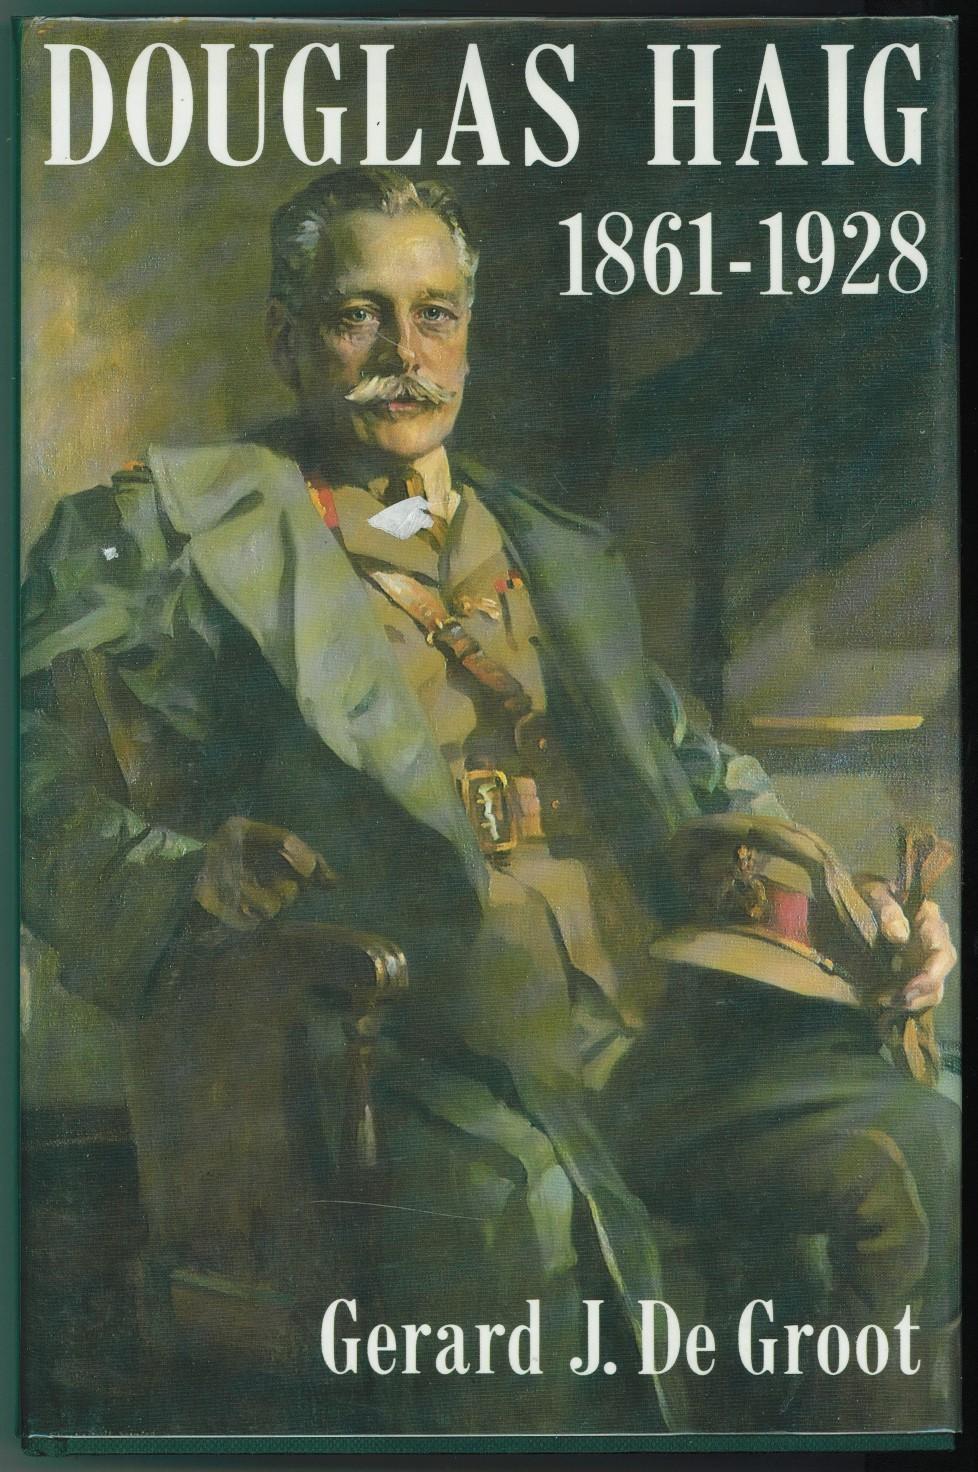 Image for Douglas Haig, 1861-1928